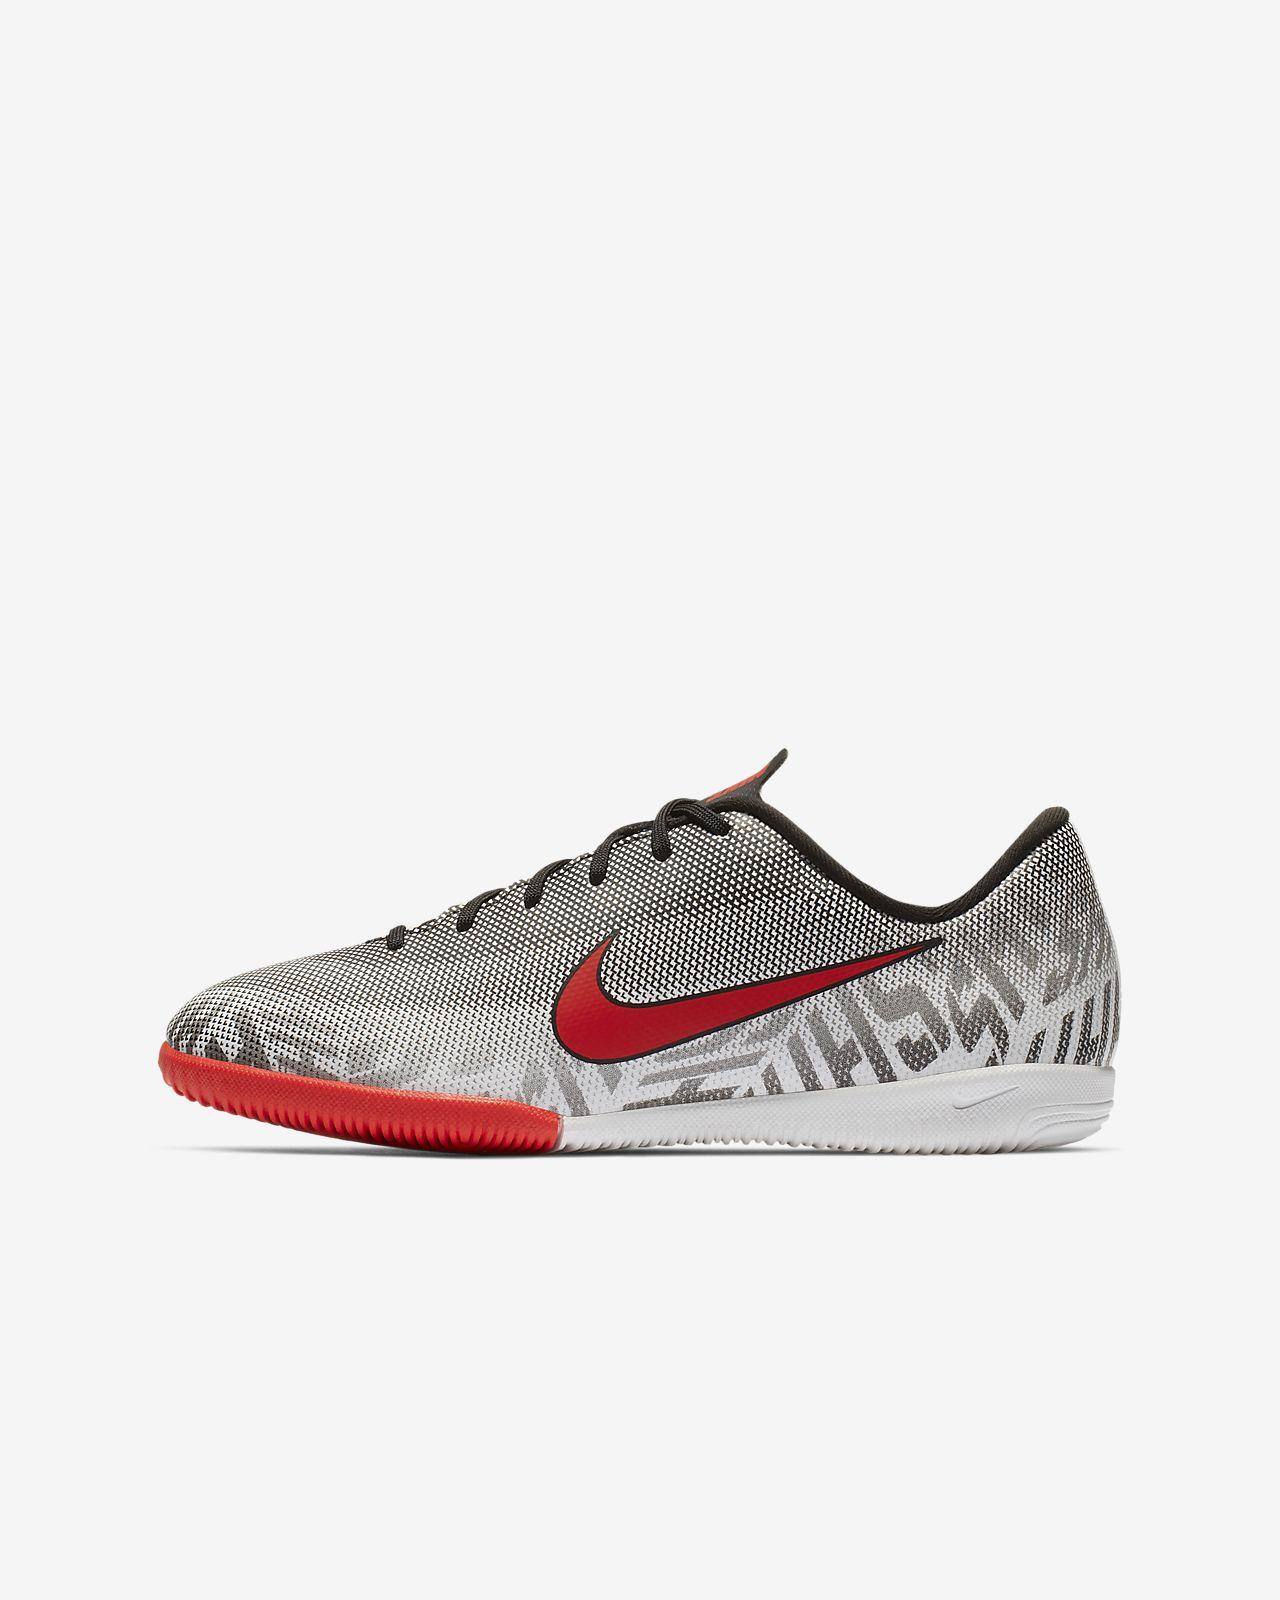 online store 954c8 b24eb ... Nike Jr. Vapor XII Academy Neymar Jr IC-fodboldsko til små/store børn